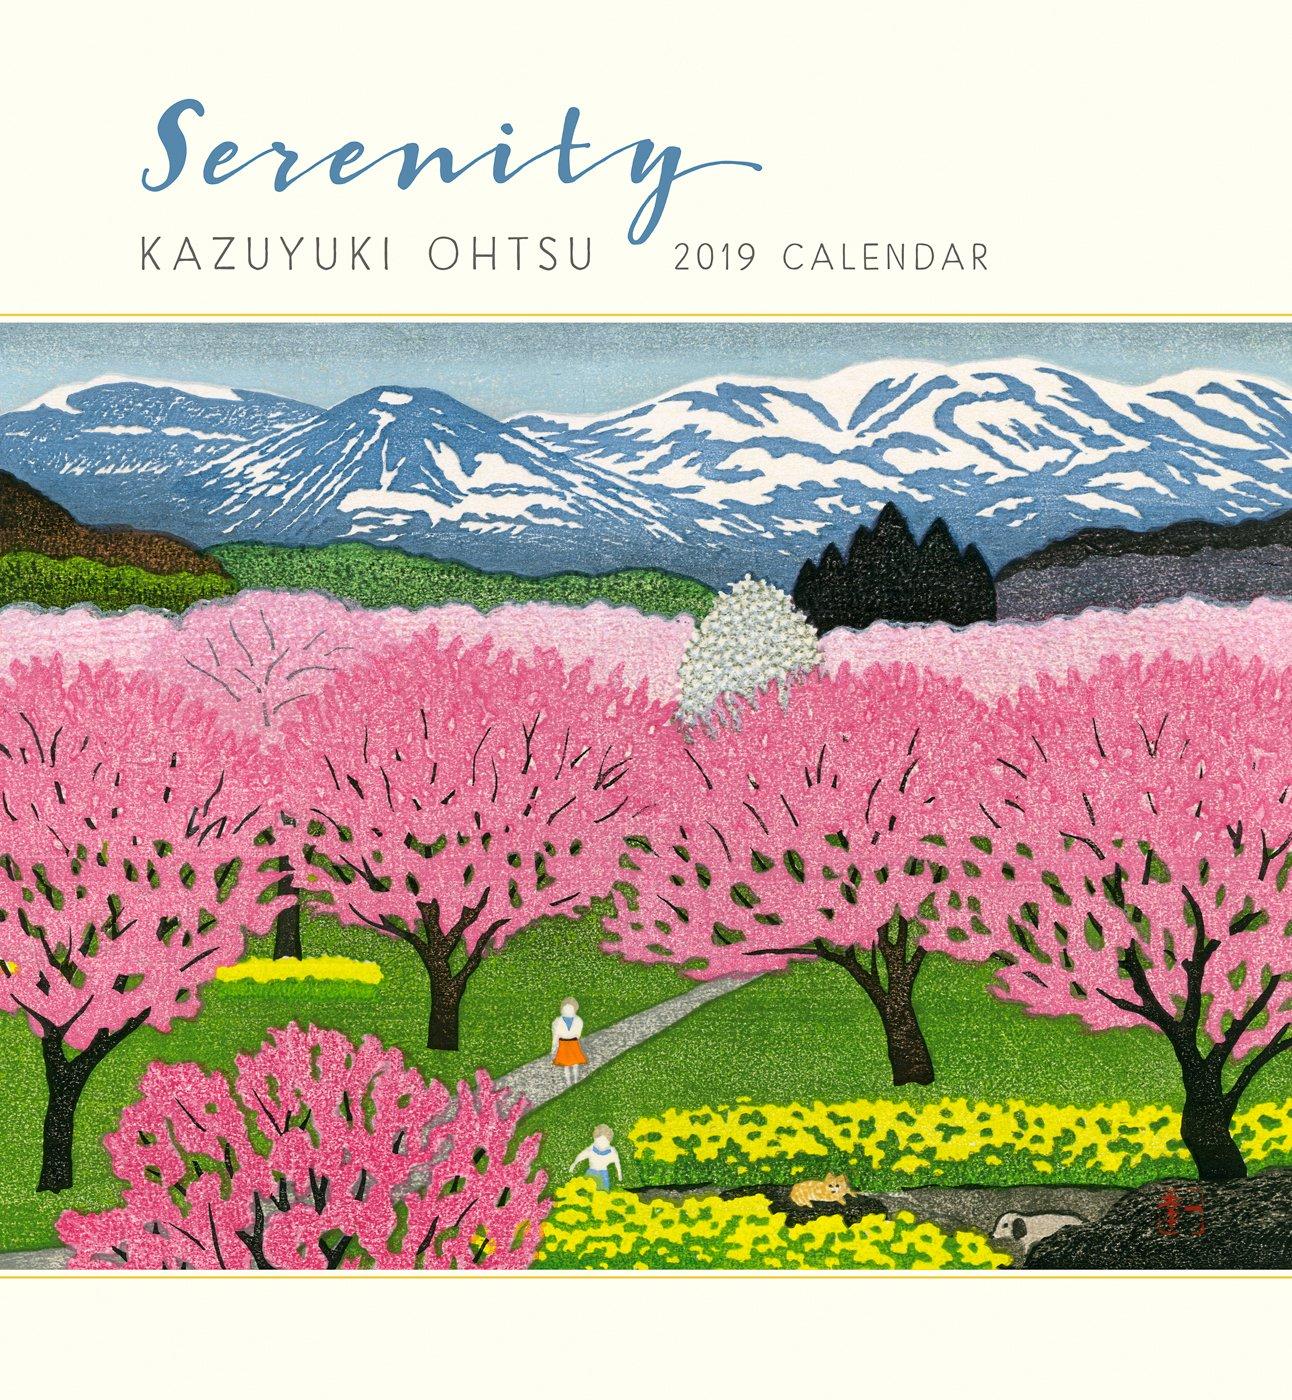 Serenity - Kazuyuki Ohtsu 2019 Calendar